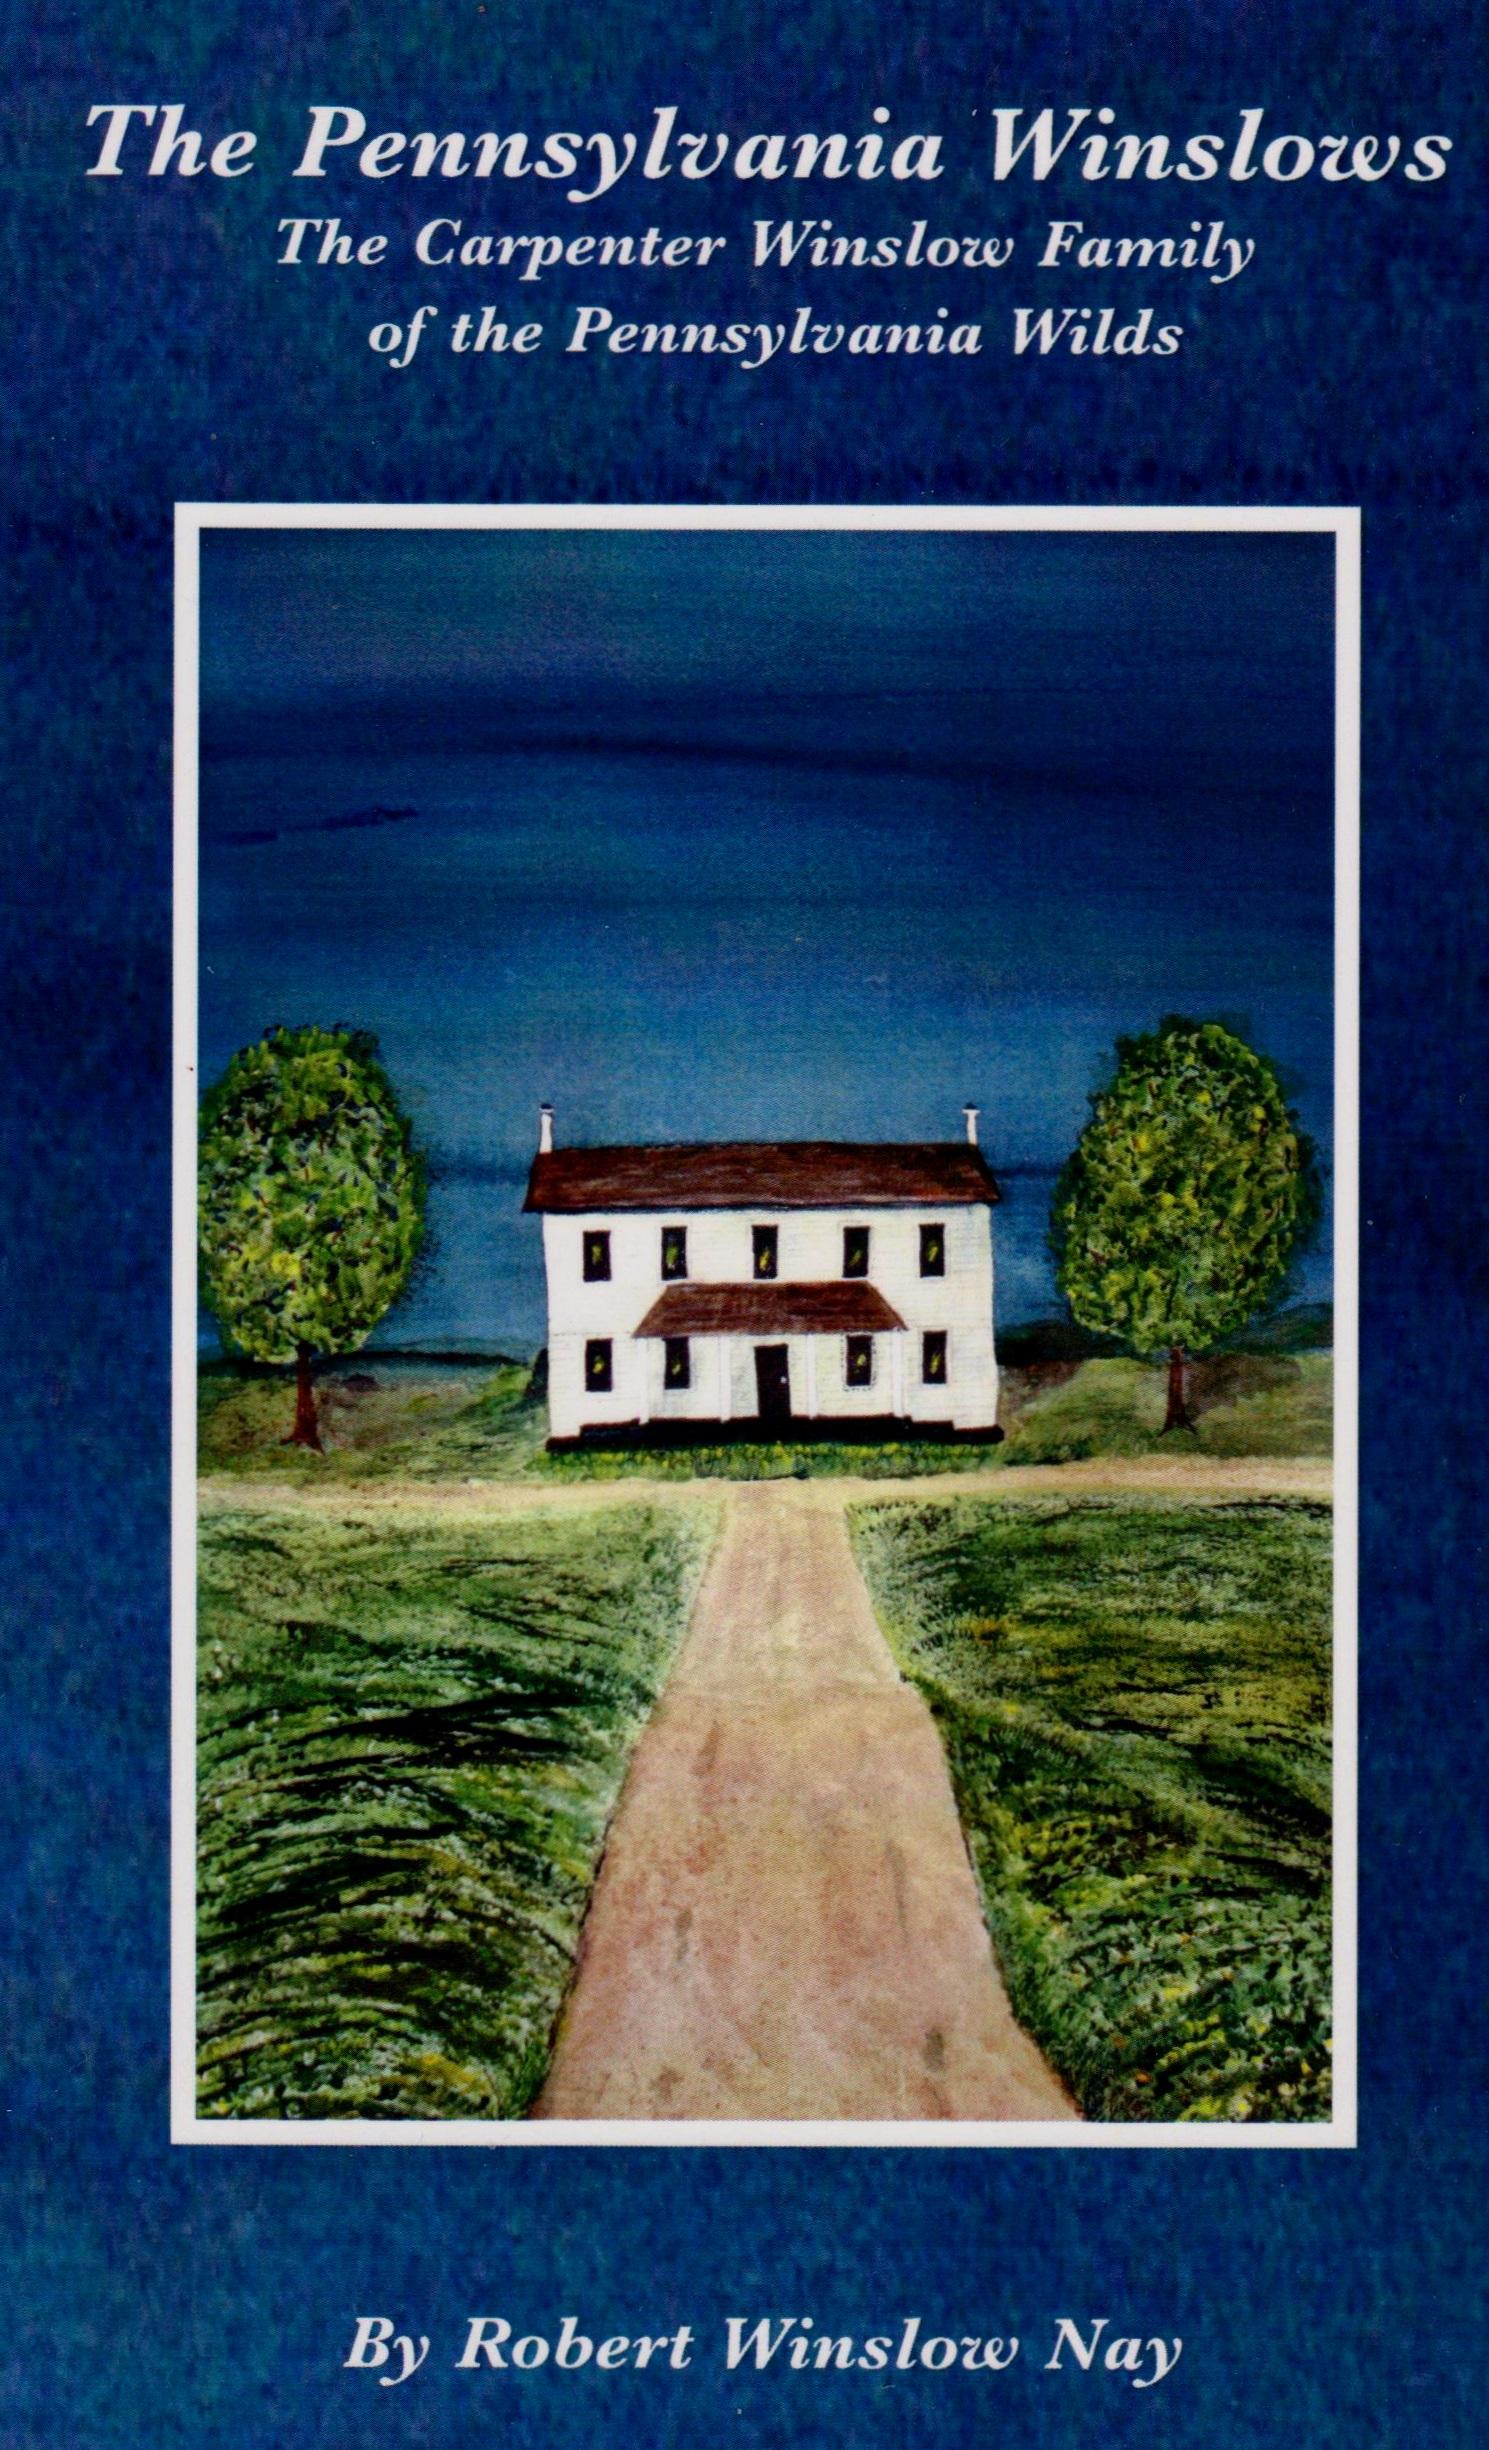 The Pennsylvania Winslows